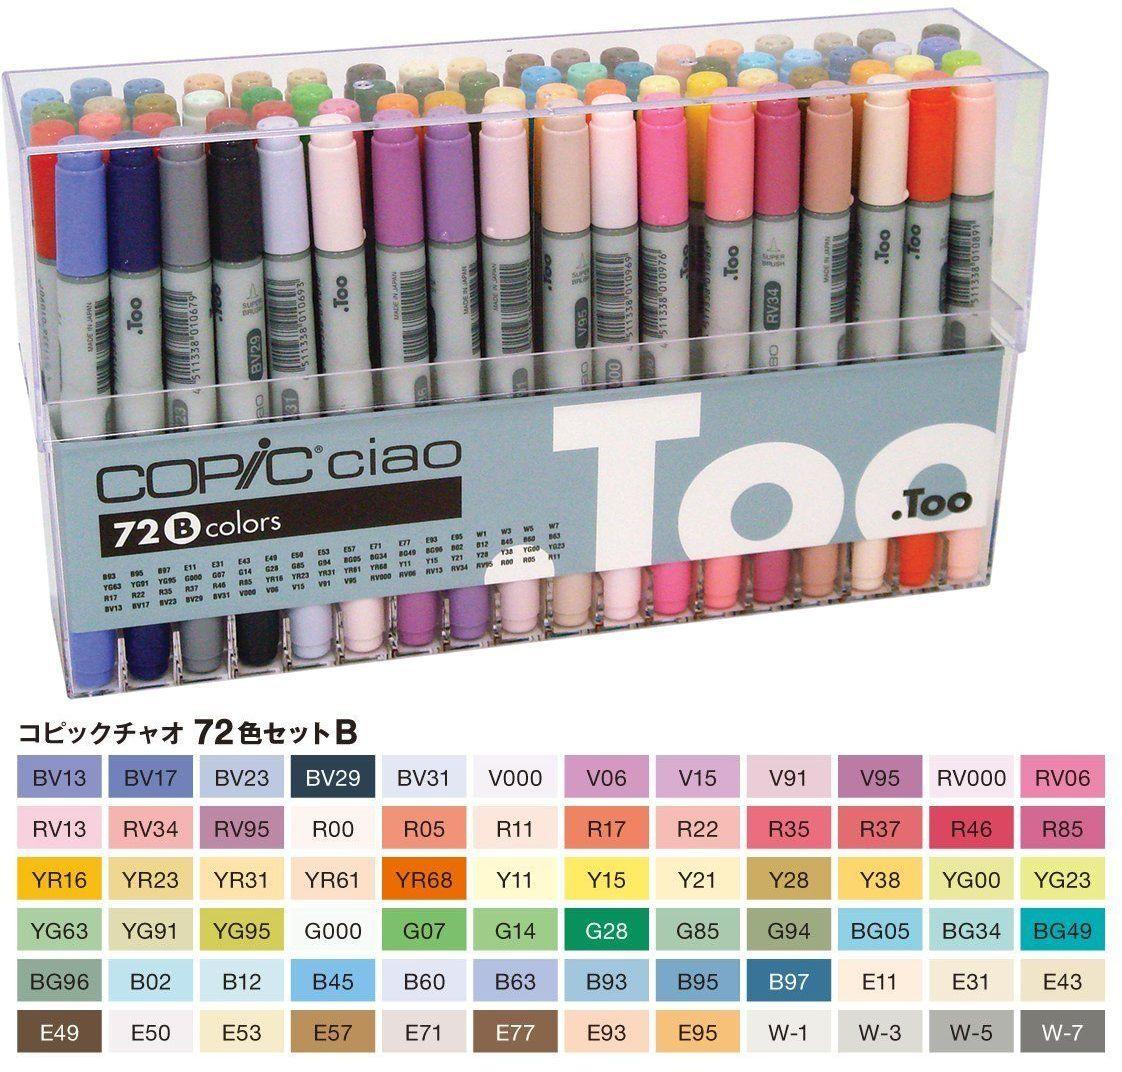 Manga Anime Comic Markers Copic Sketch Basic 36 Color Set 12502074